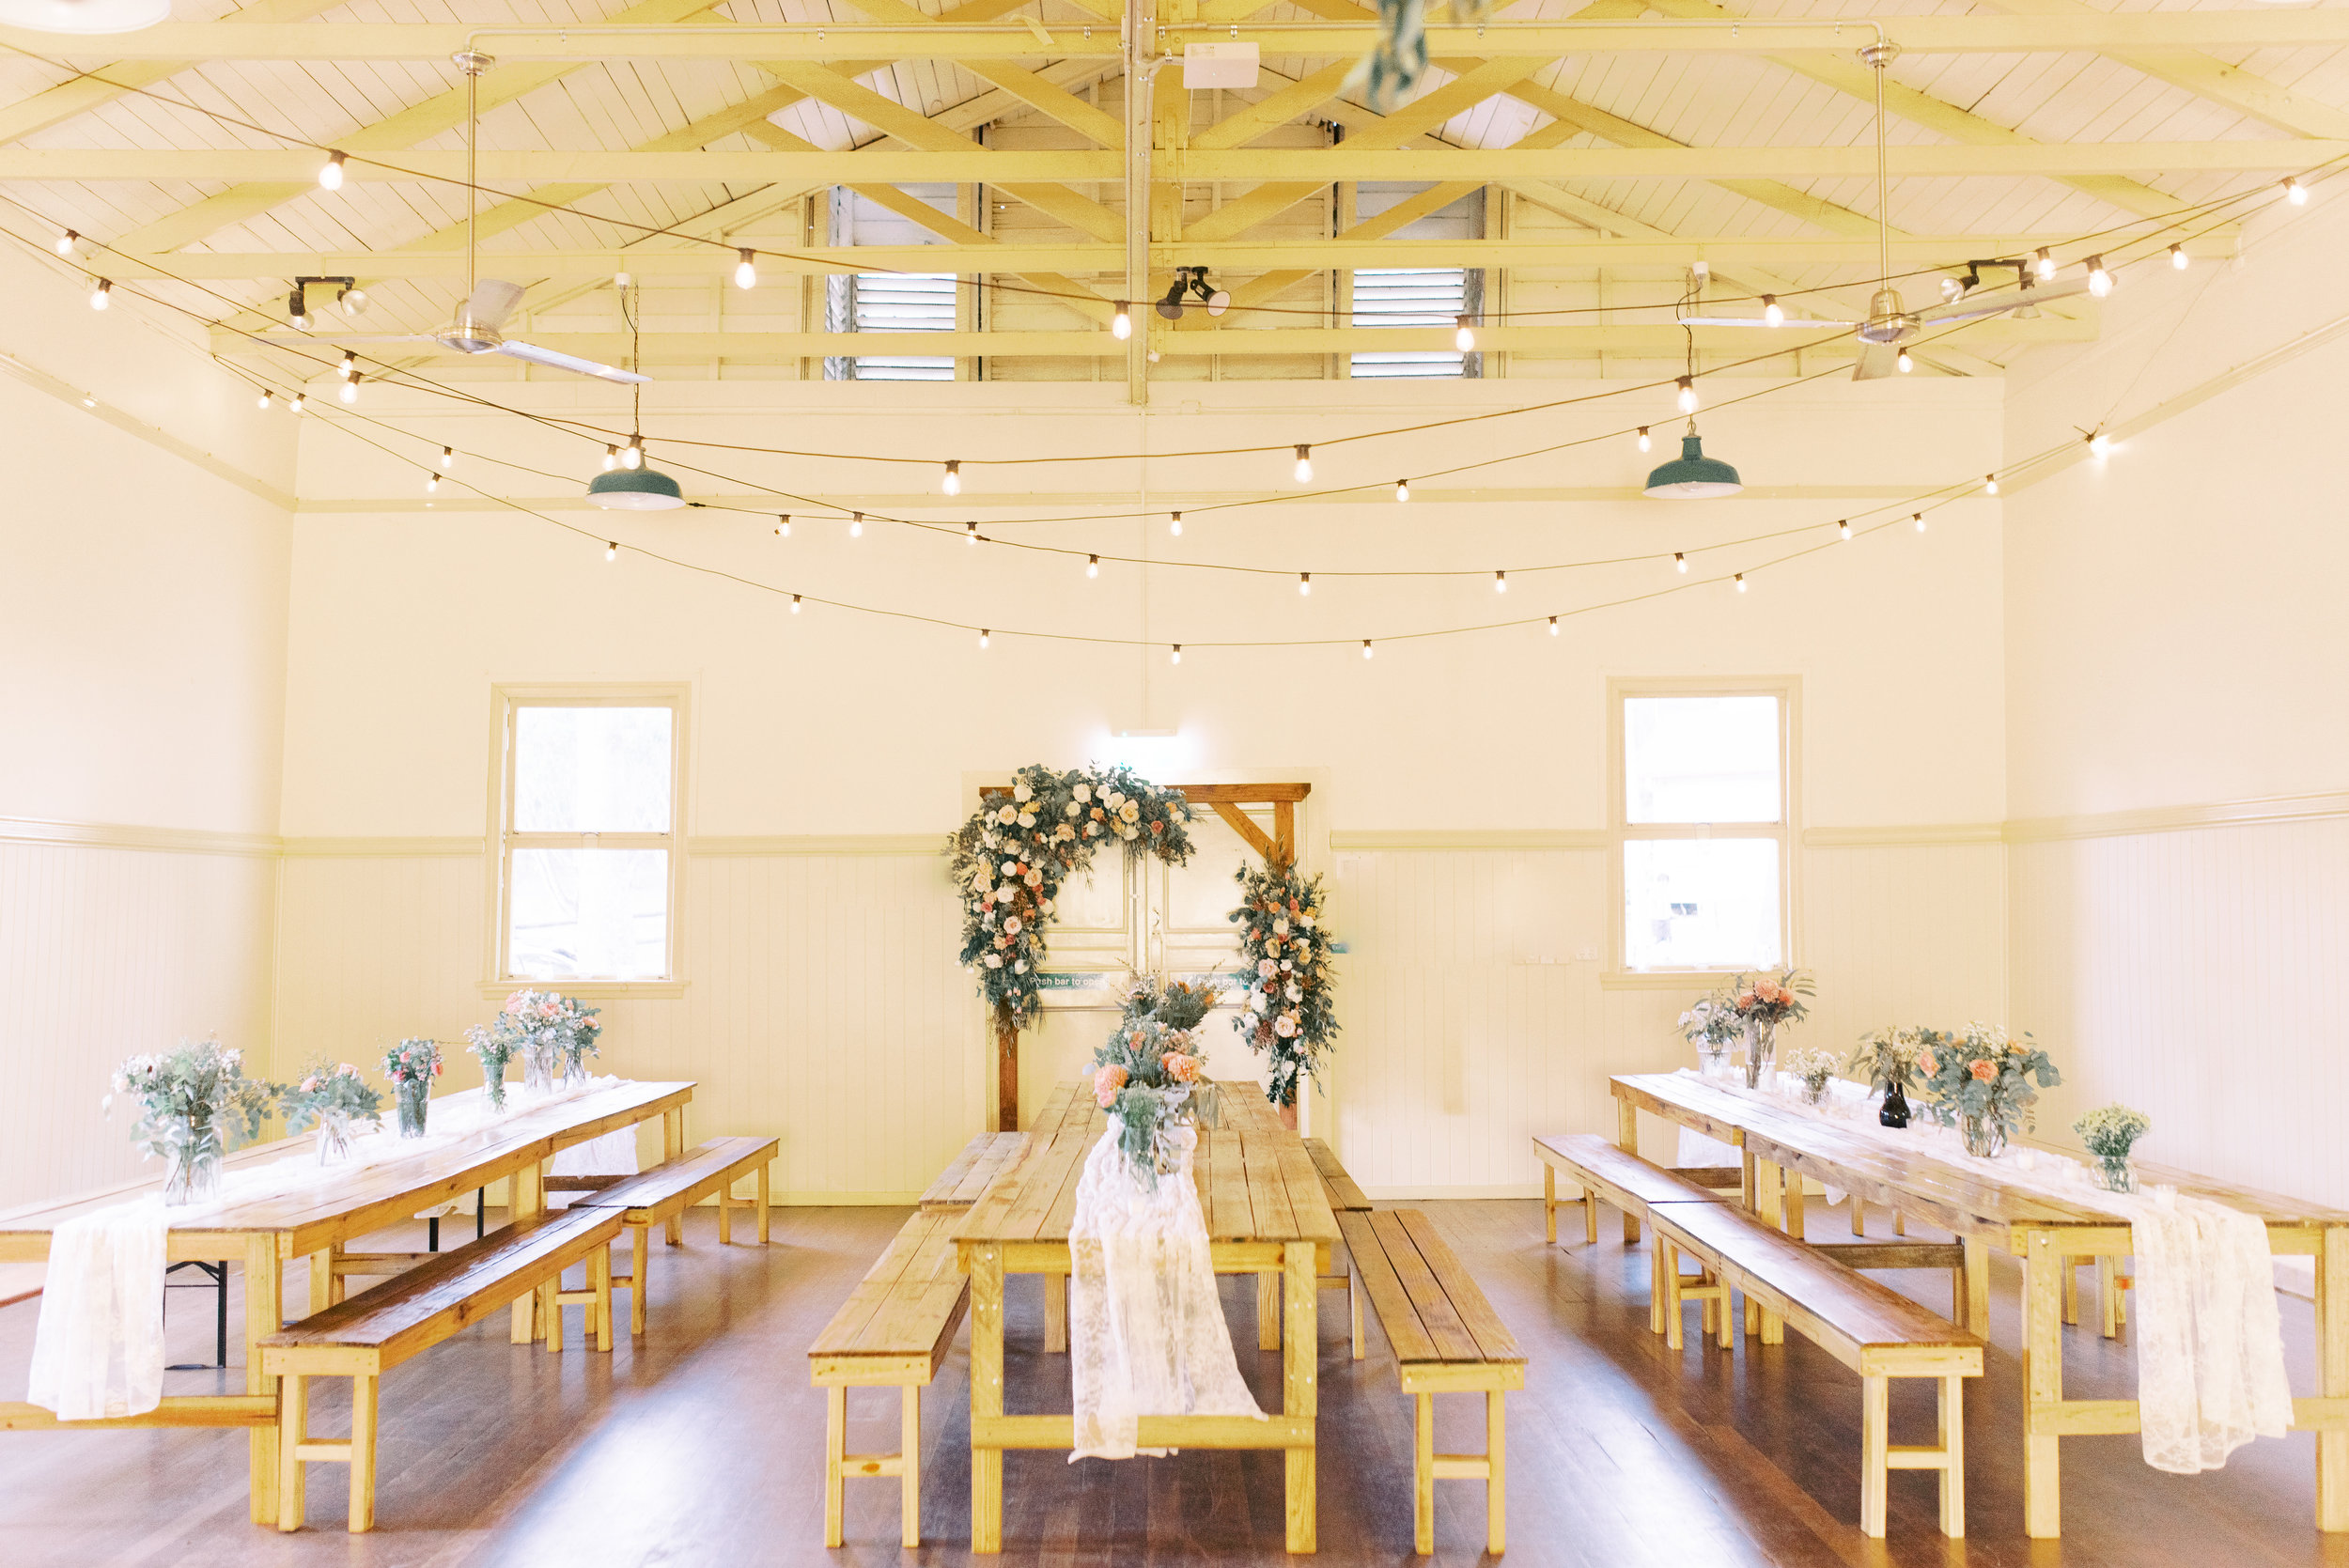 brisbane-gold-coast-sunshine-coast-tweed-romantic-fine-art-wedding-photography-lauren-olivia-53.jpg